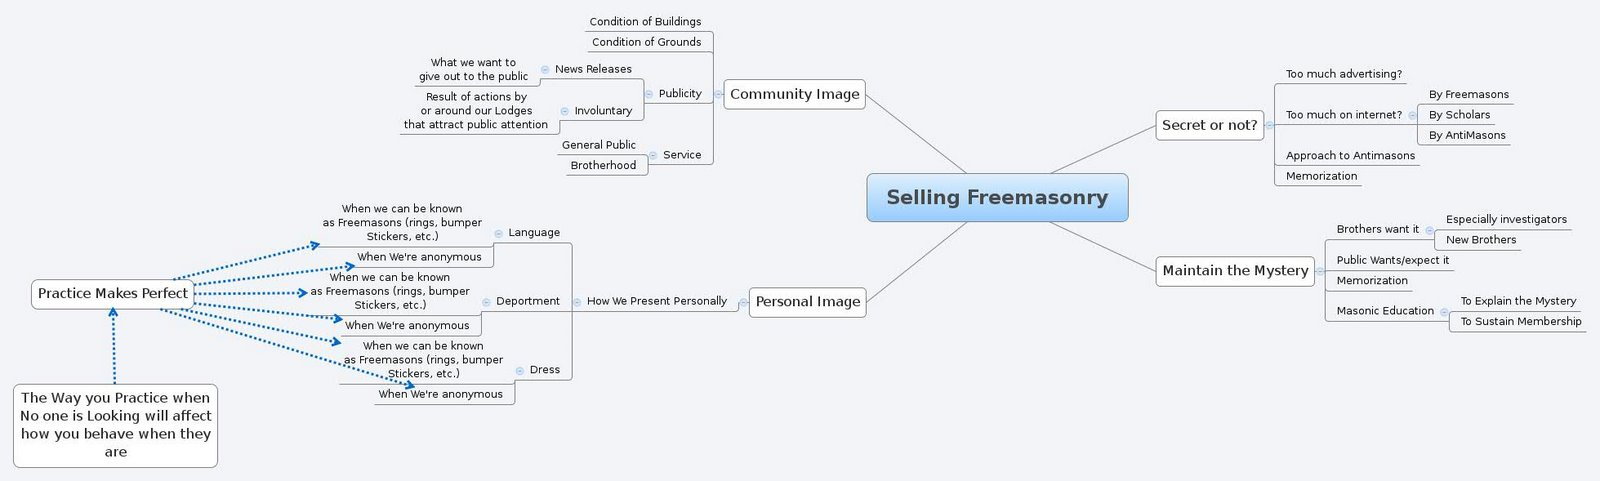 [selling]